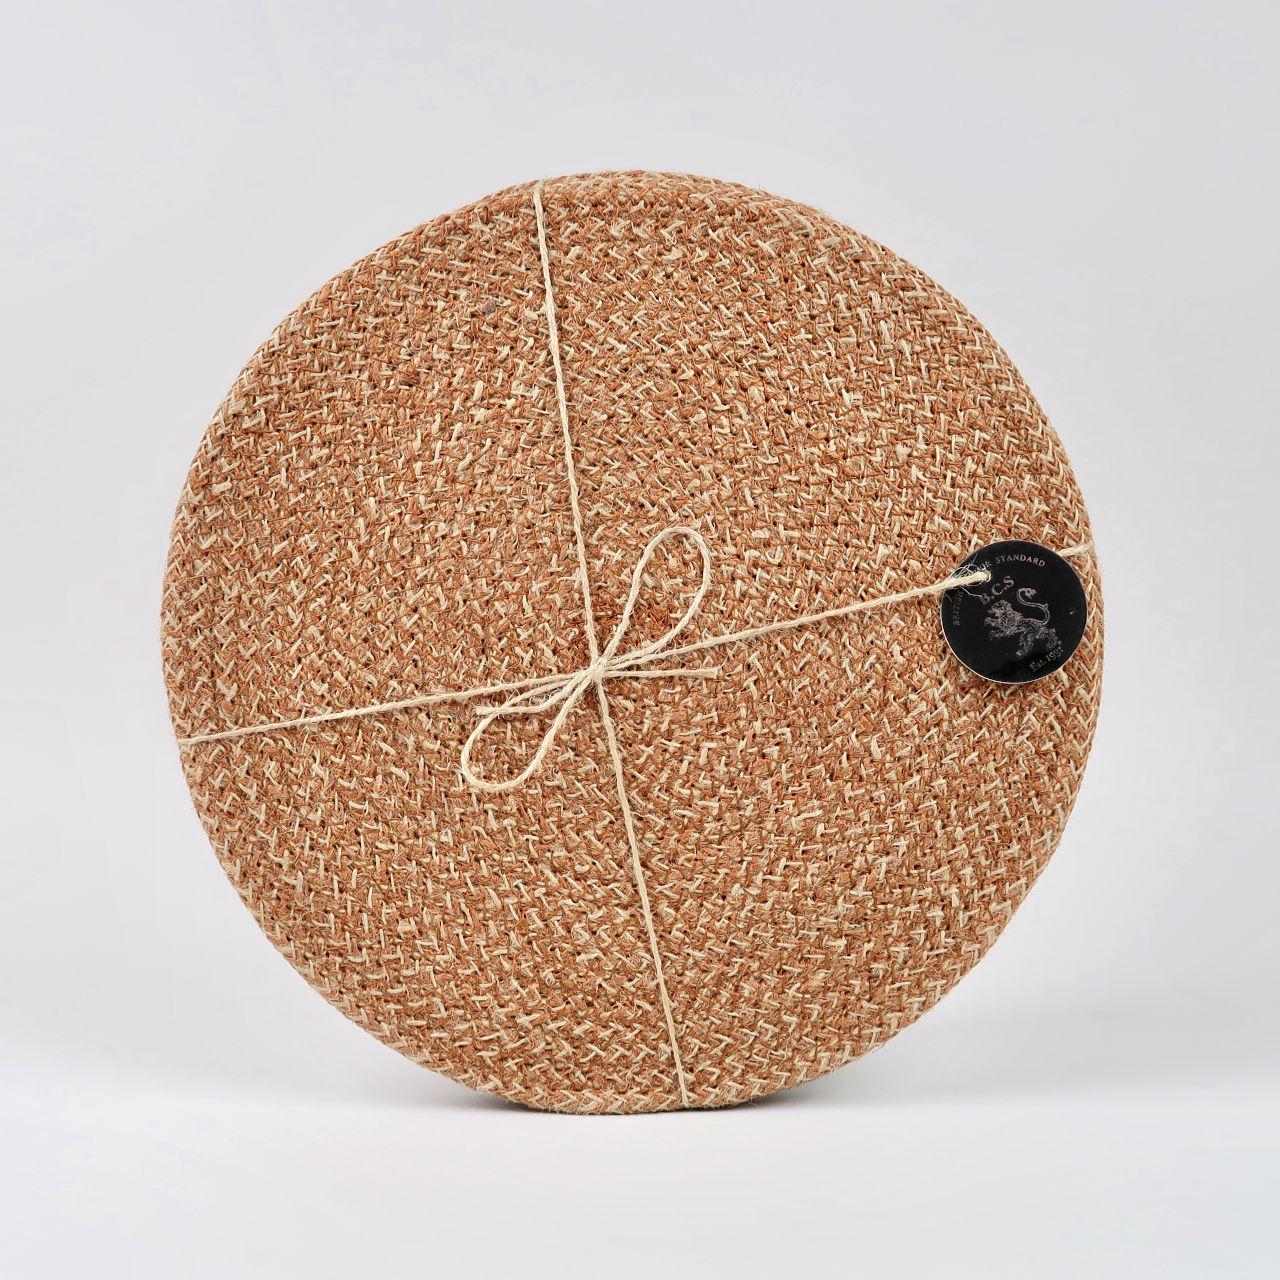 Set of 4 Woven Jute Placemats - Brick Dust